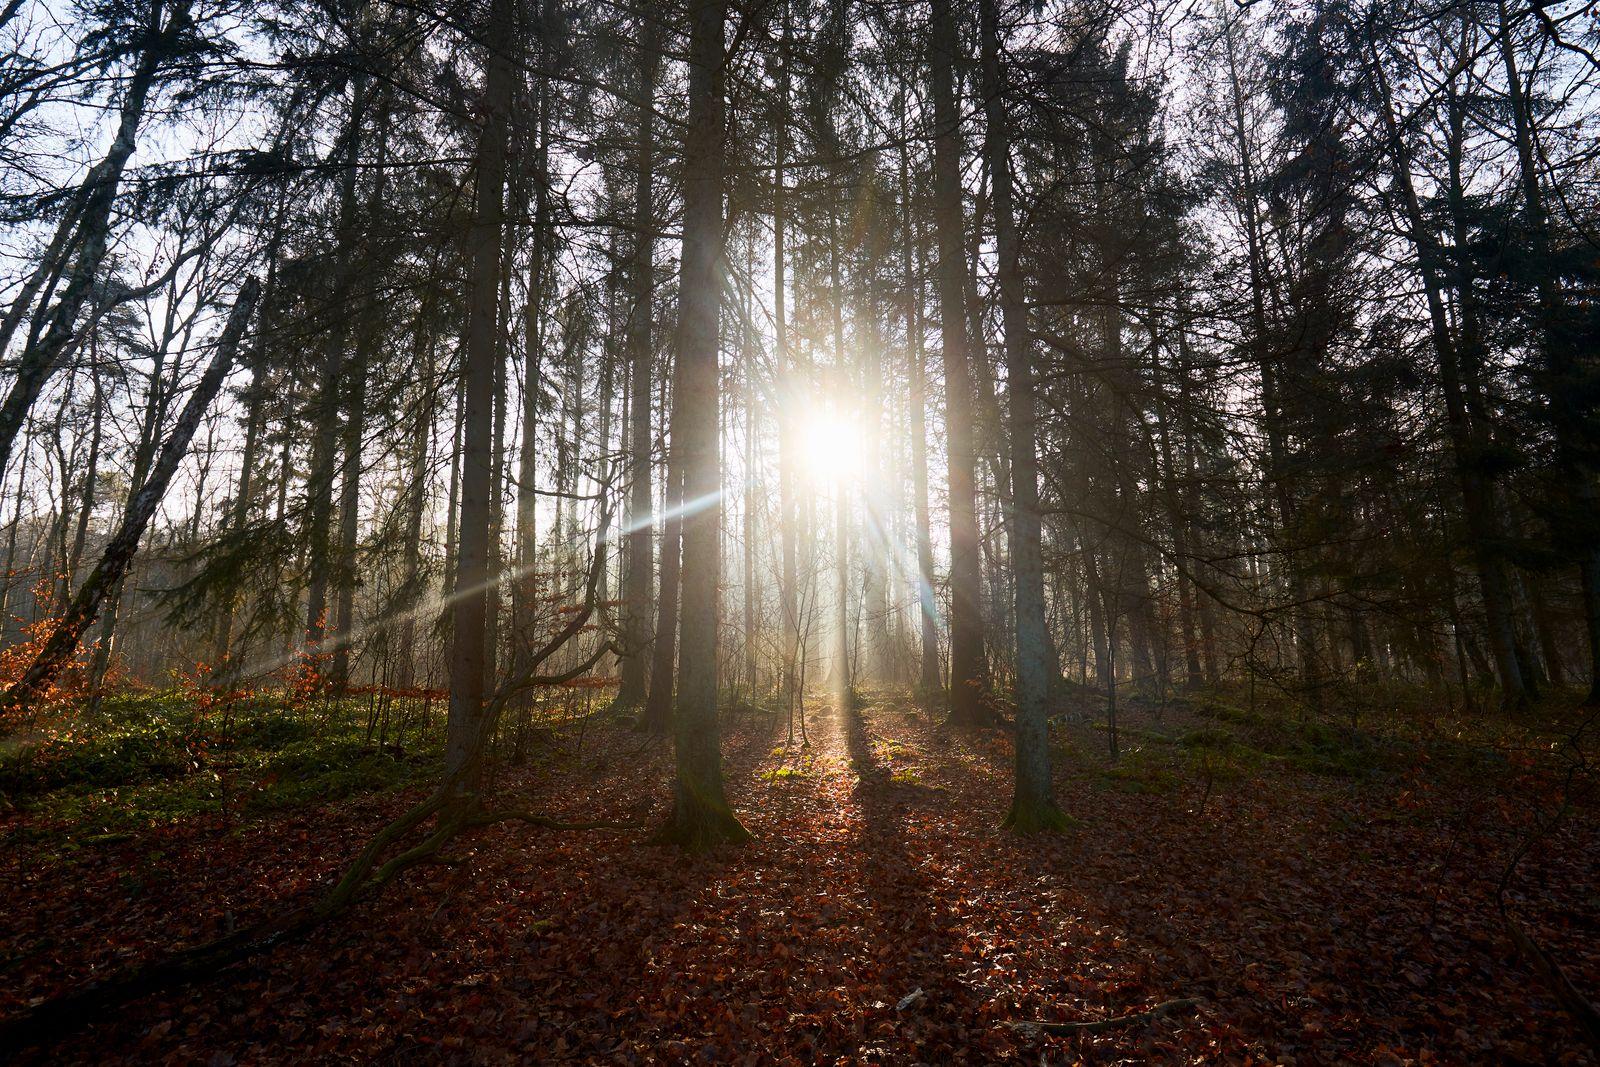 Mystic coniferous forest against sunlight